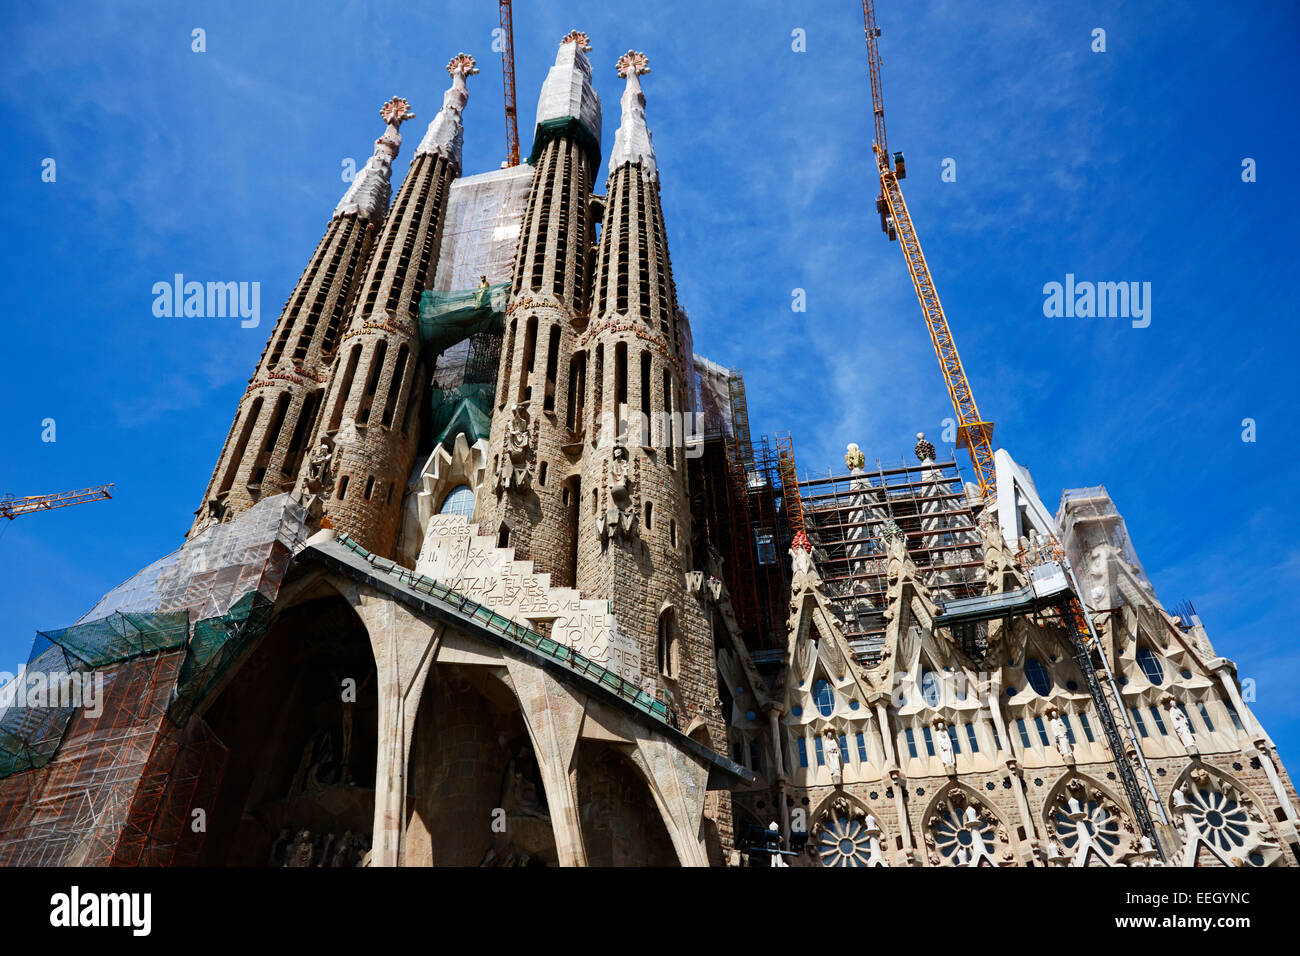 the passion facade of the Sagrada Familia Barcelona Catalonia Spain - Stock Image